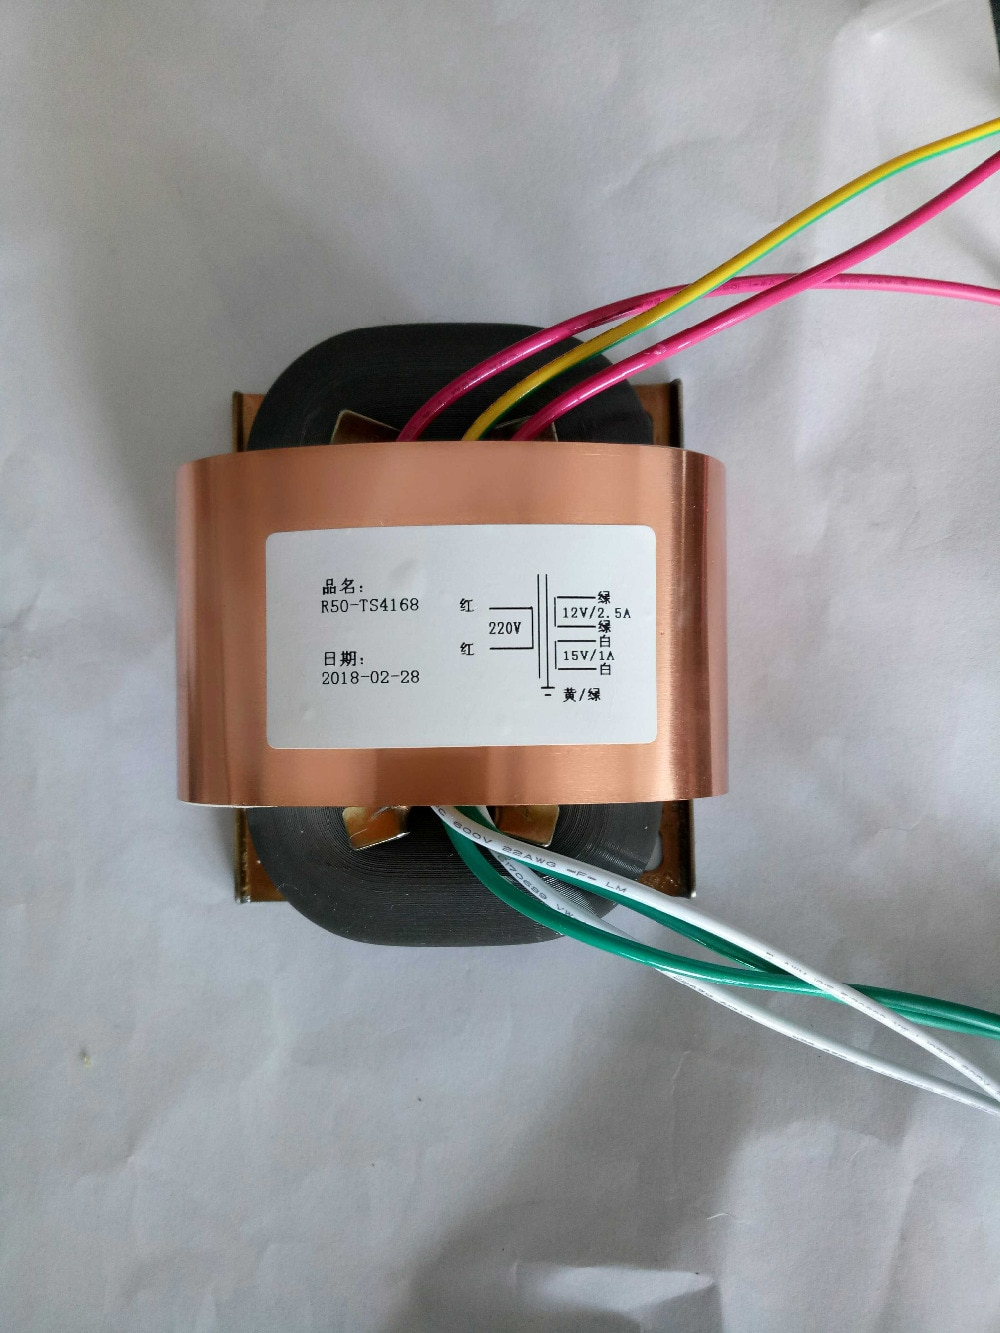 220V 60 W-R-núcleo transformador 12V2.5A 15 V/1A para amplificador de Audio preamplificadores AMP DAC R Core